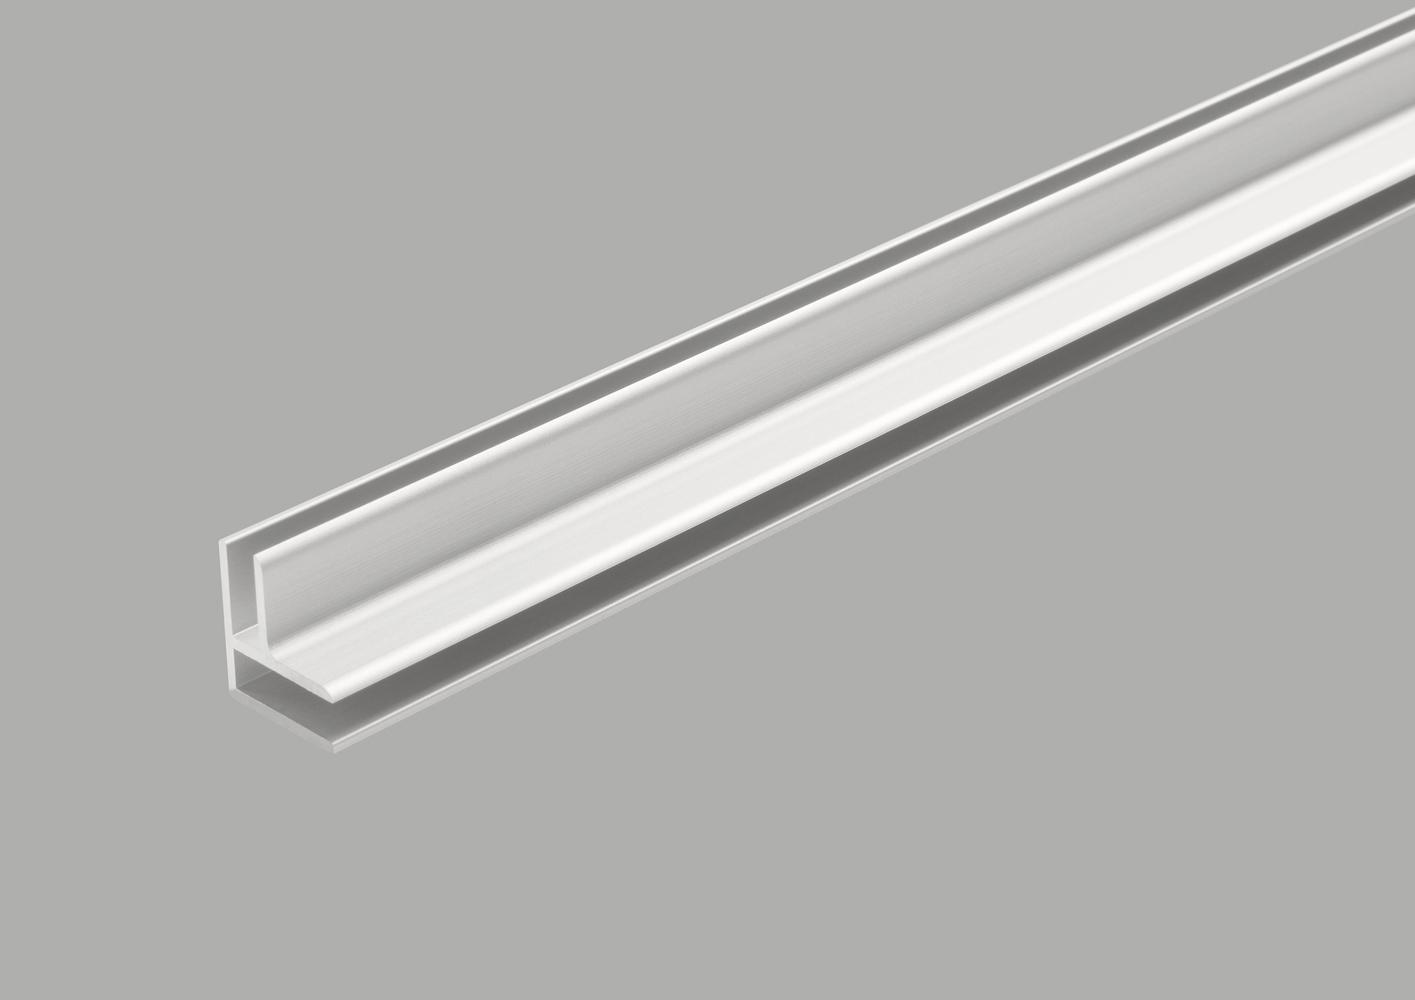 Coller Corniere Alu Sur Carrelage Exterieur profil de coin universel en aluminium dumawall - mr.bricolage